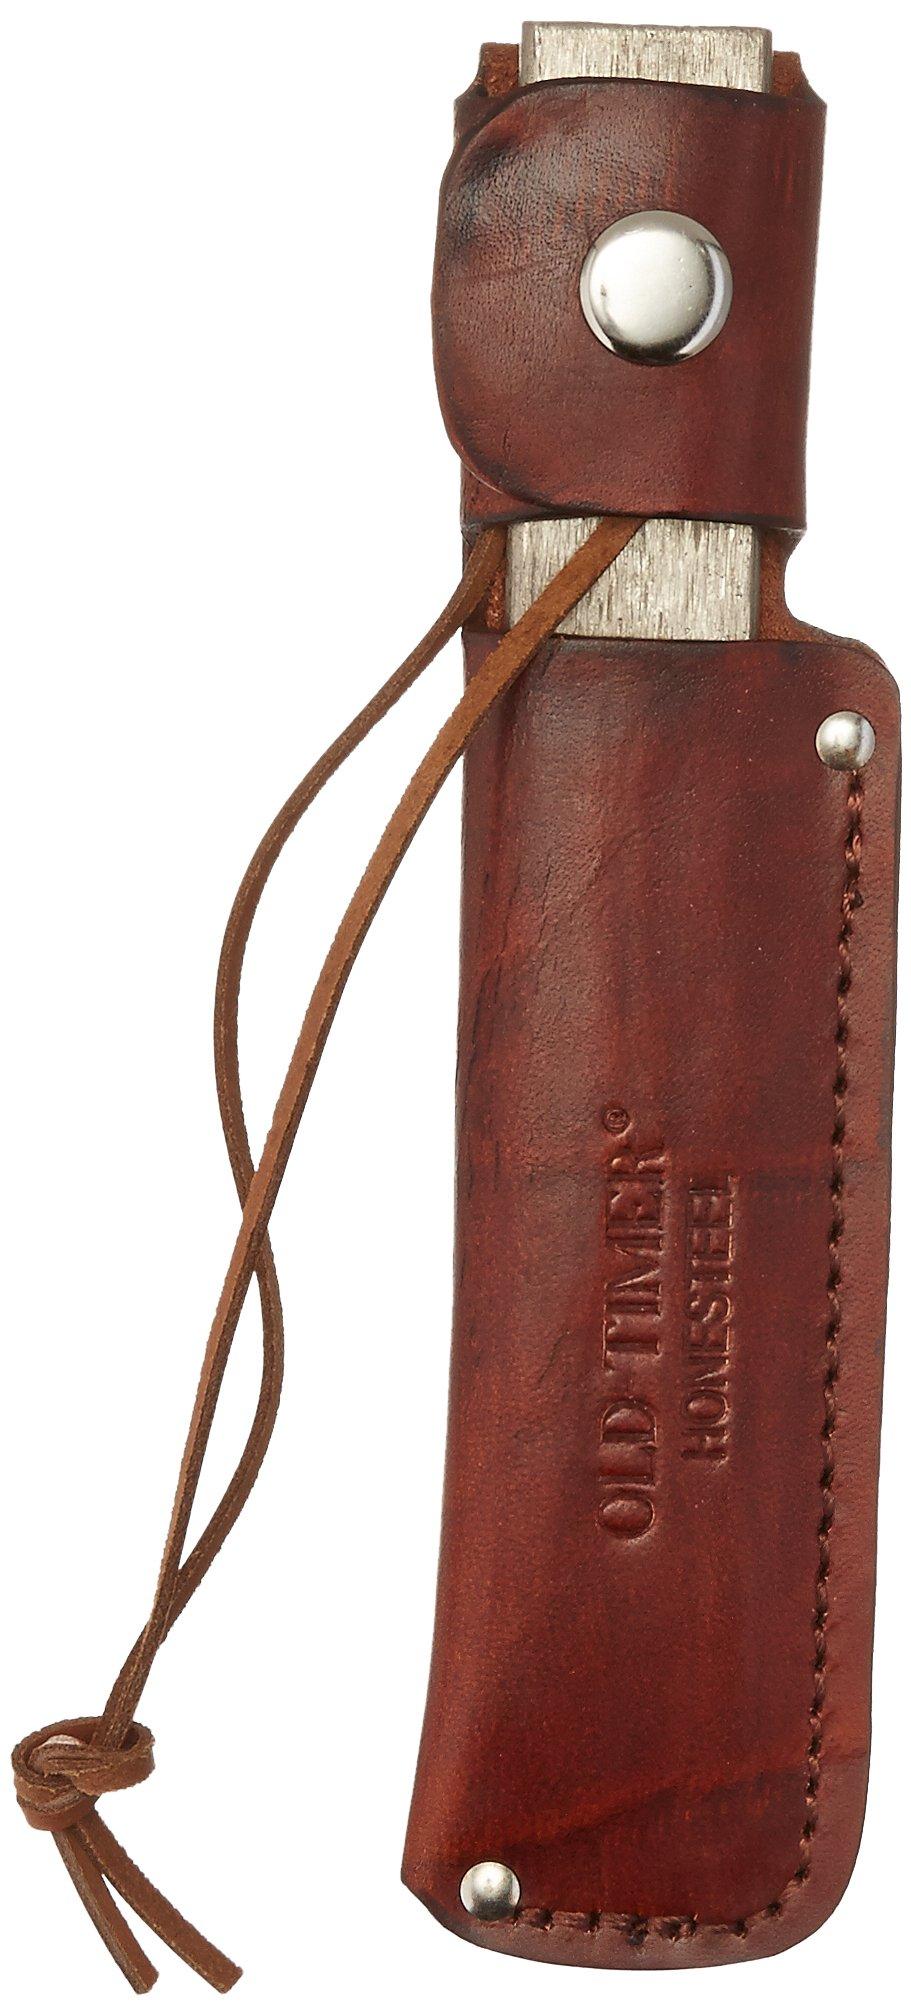 Old Timer HS1 Honesteel with Brown Leather Belt Sheath